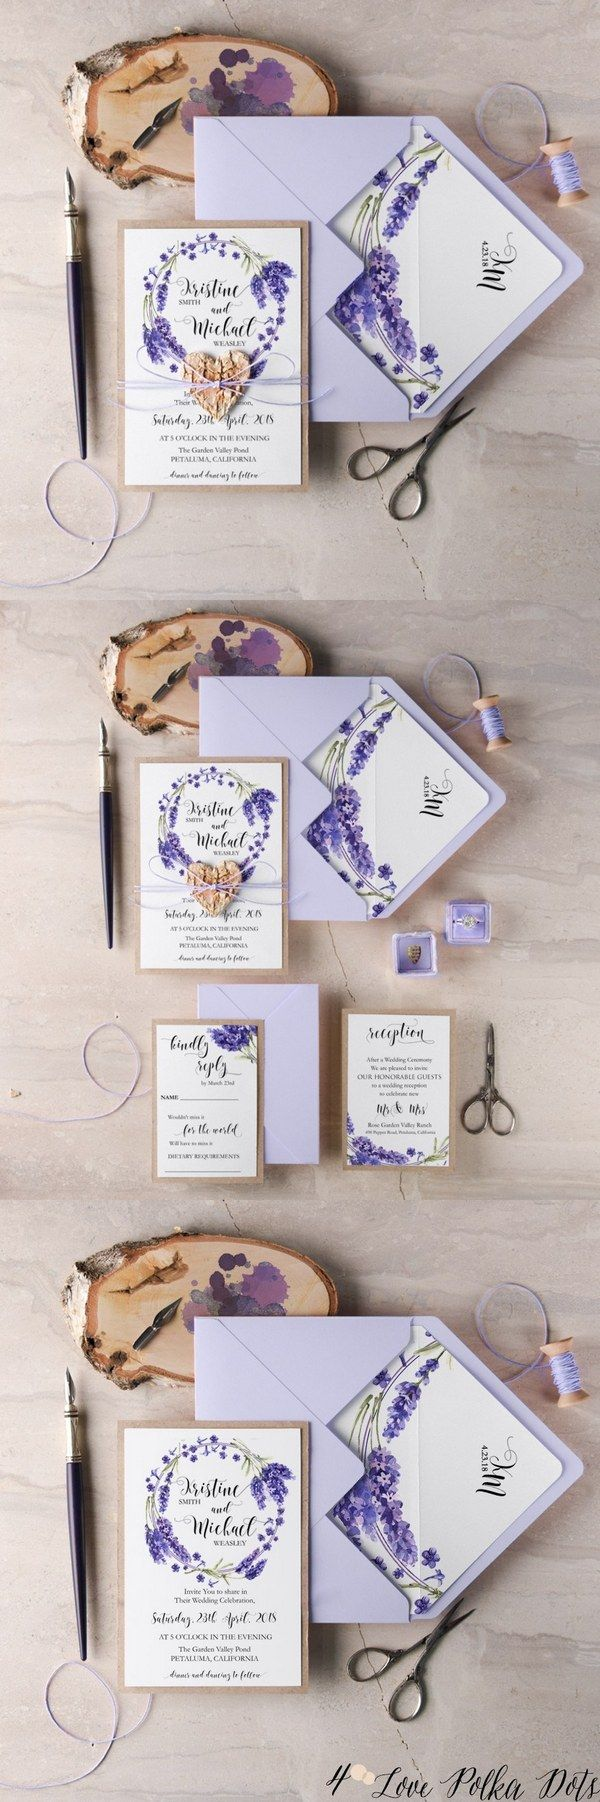 Purple hydrangea wedding invitation sample - Lavender Purple Watercolor Wedding Invitations